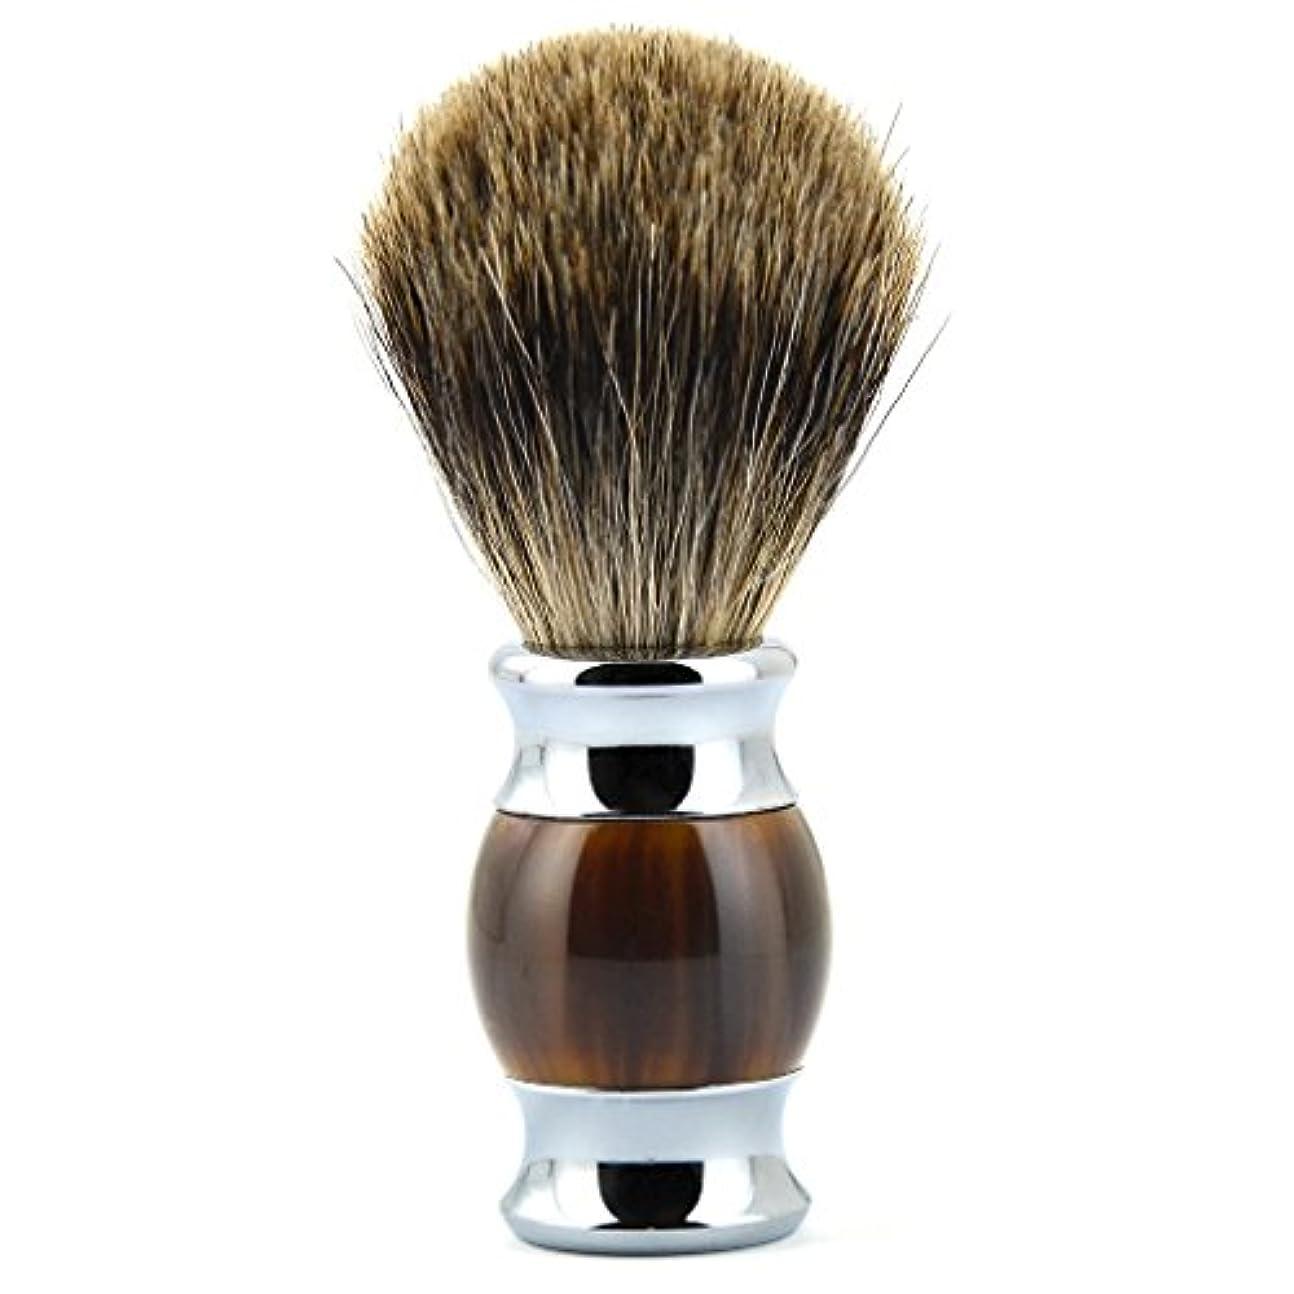 TopFires ひげブラシ シェービング ブラシ シェービング用ブラシ メンズ 100% アナグマ毛 理容 洗顔 髭剃り 泡立ち 【品質保証】